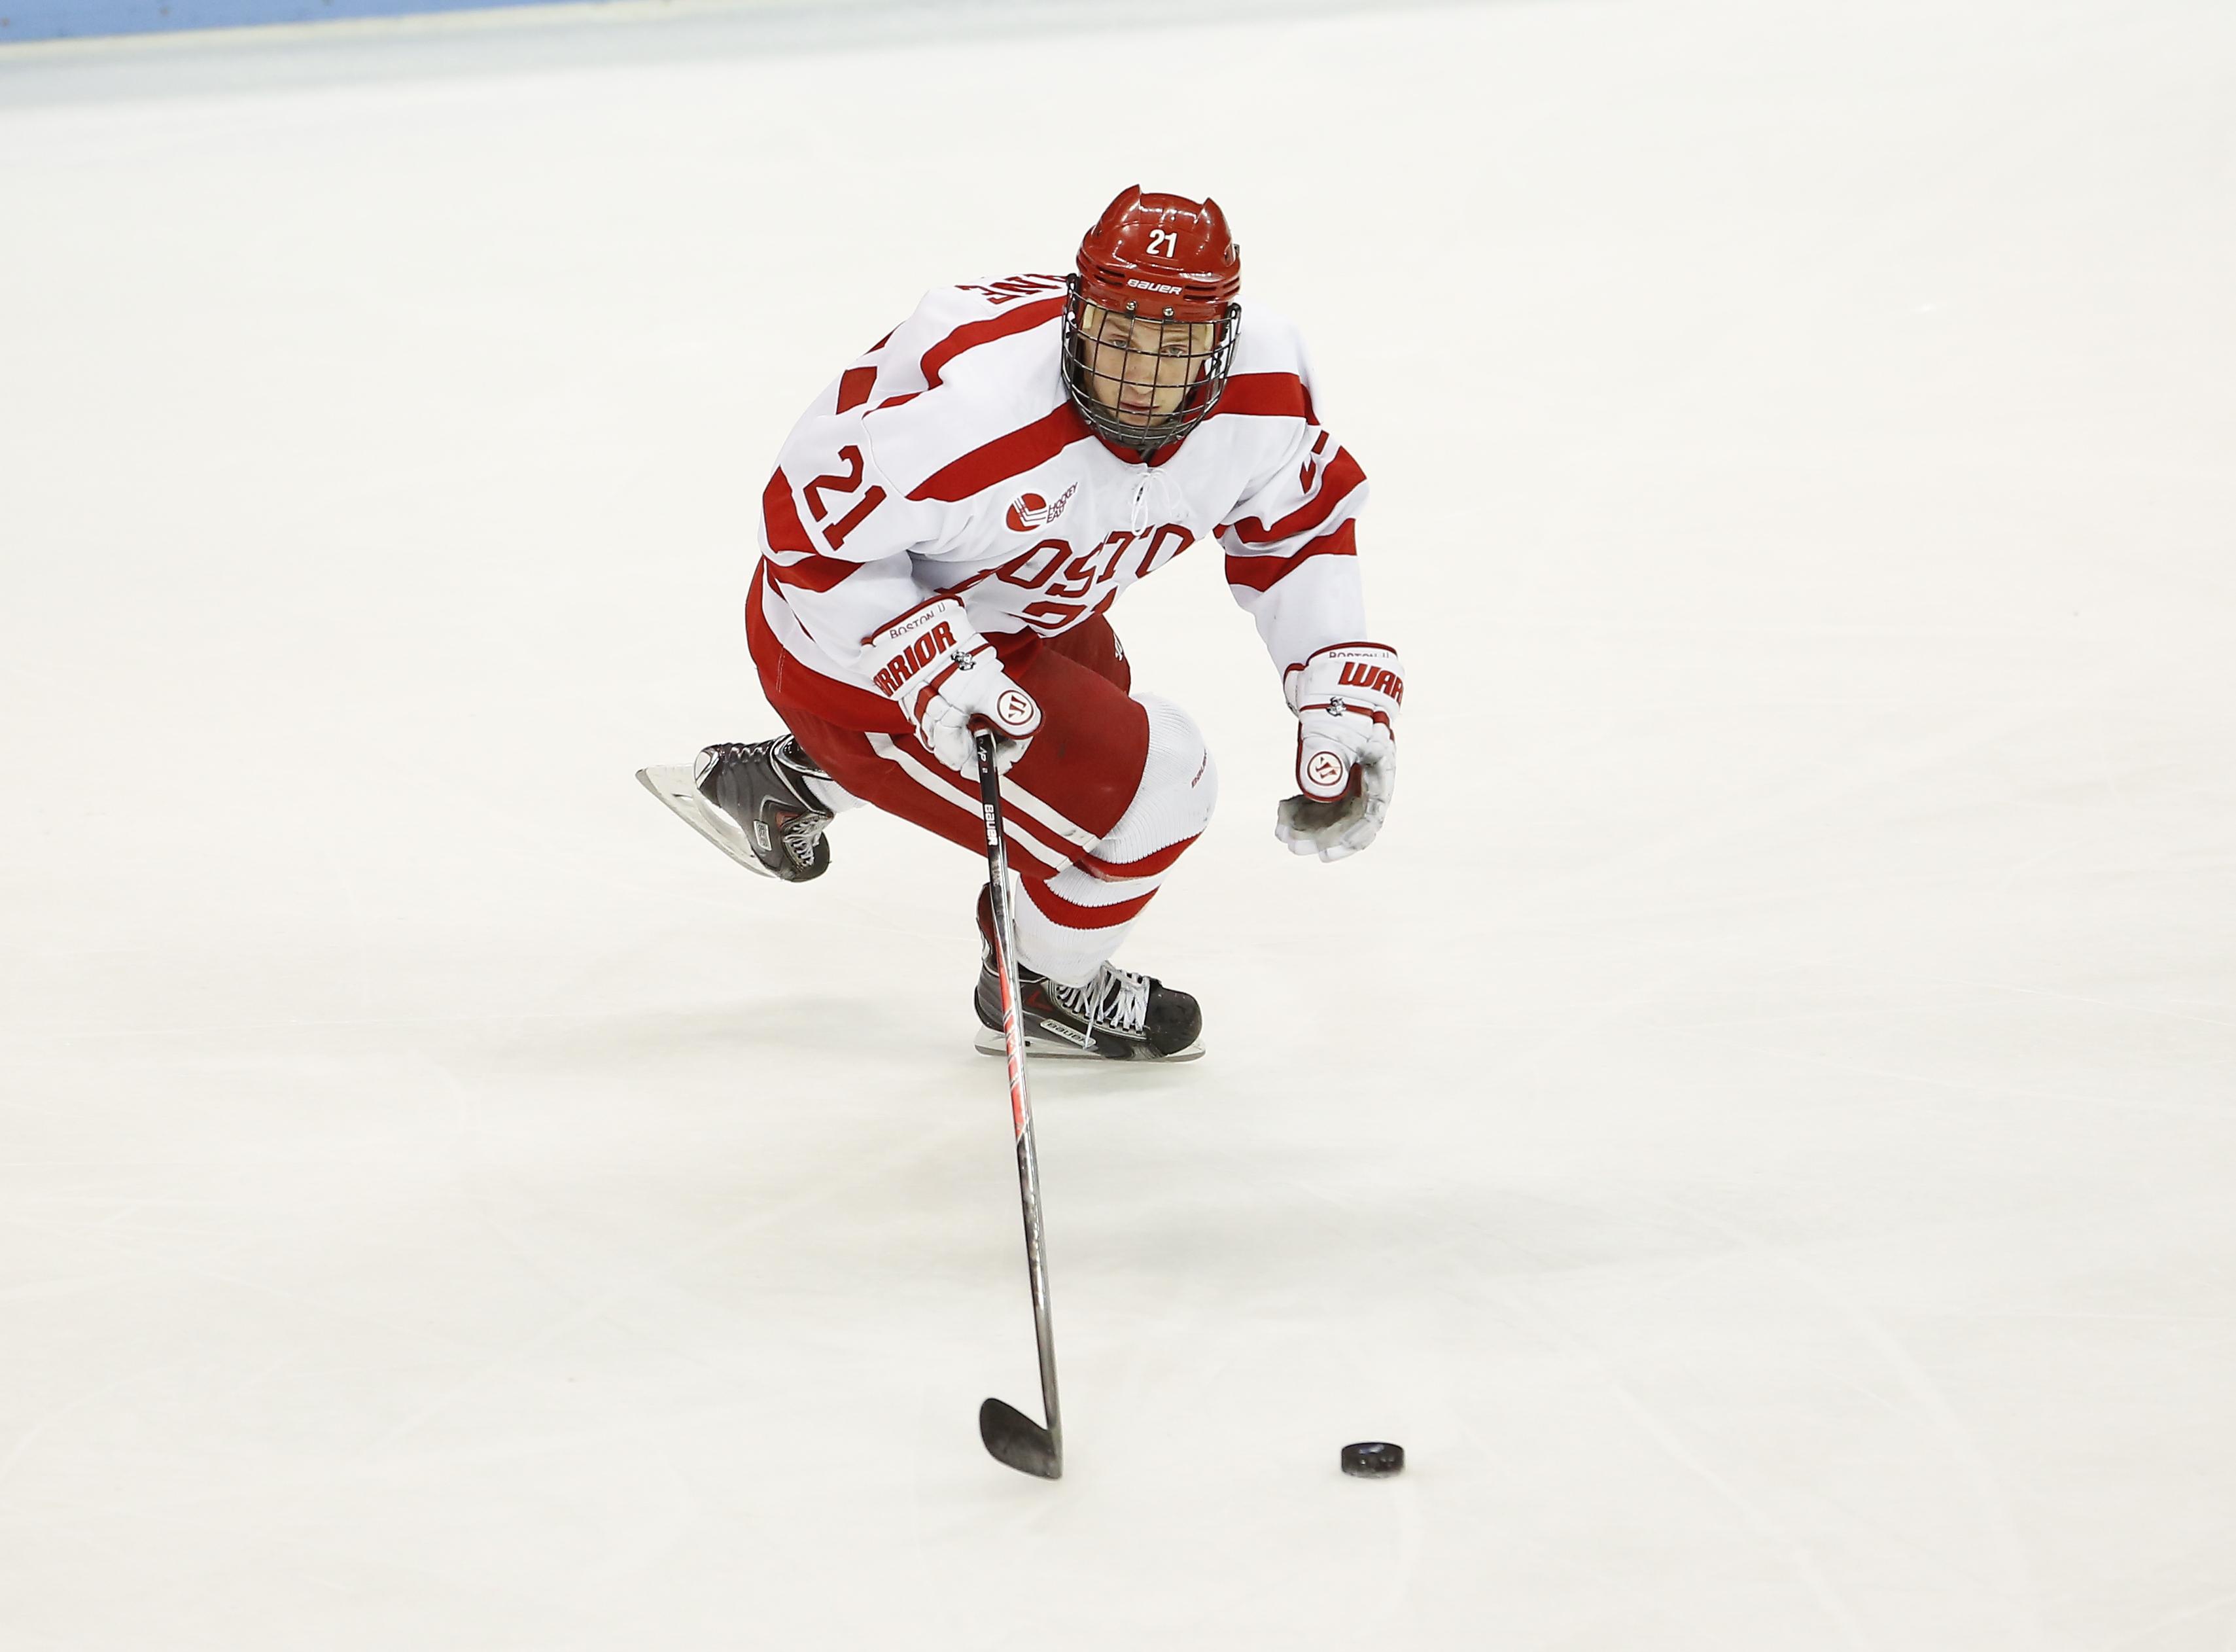 Hockey East: BU Tops Merrimack In Final Beanpot Tuneup, 4-0